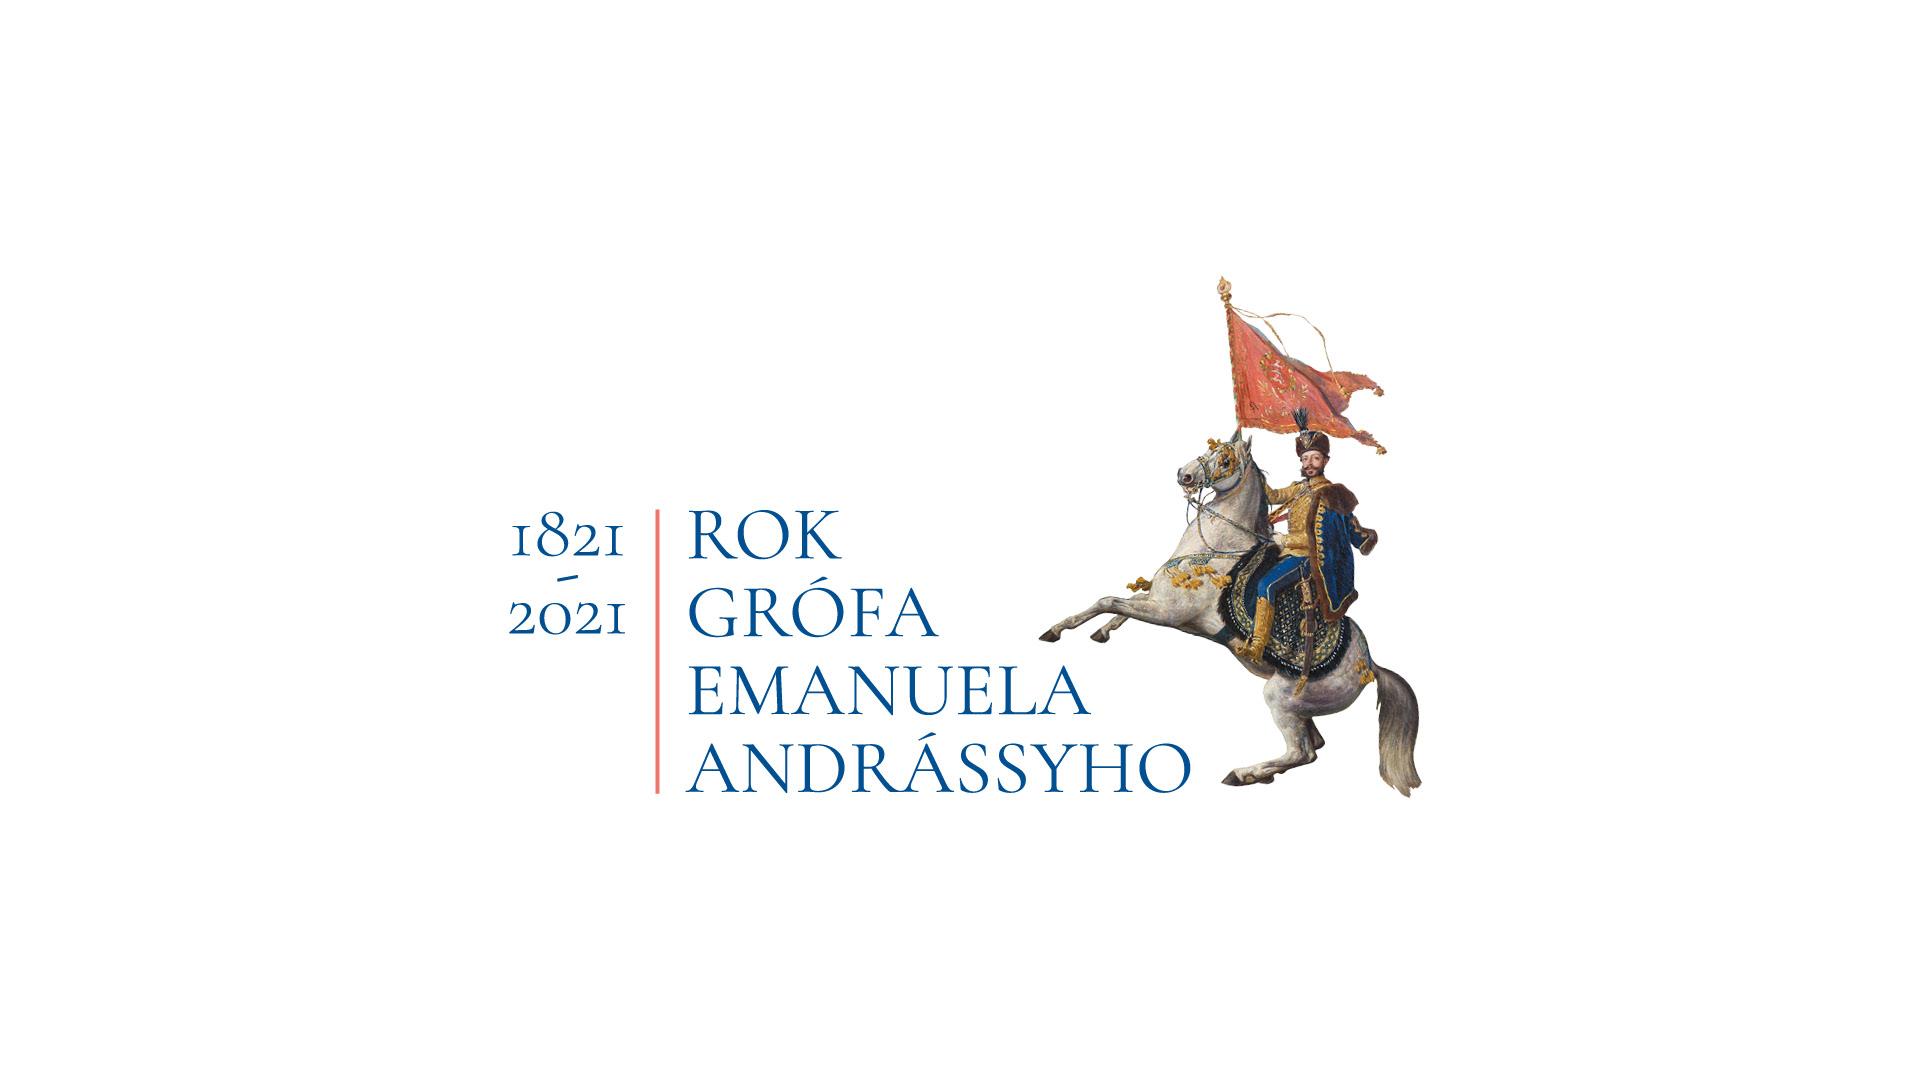 Rok Grófa Emanuela Andrássyho